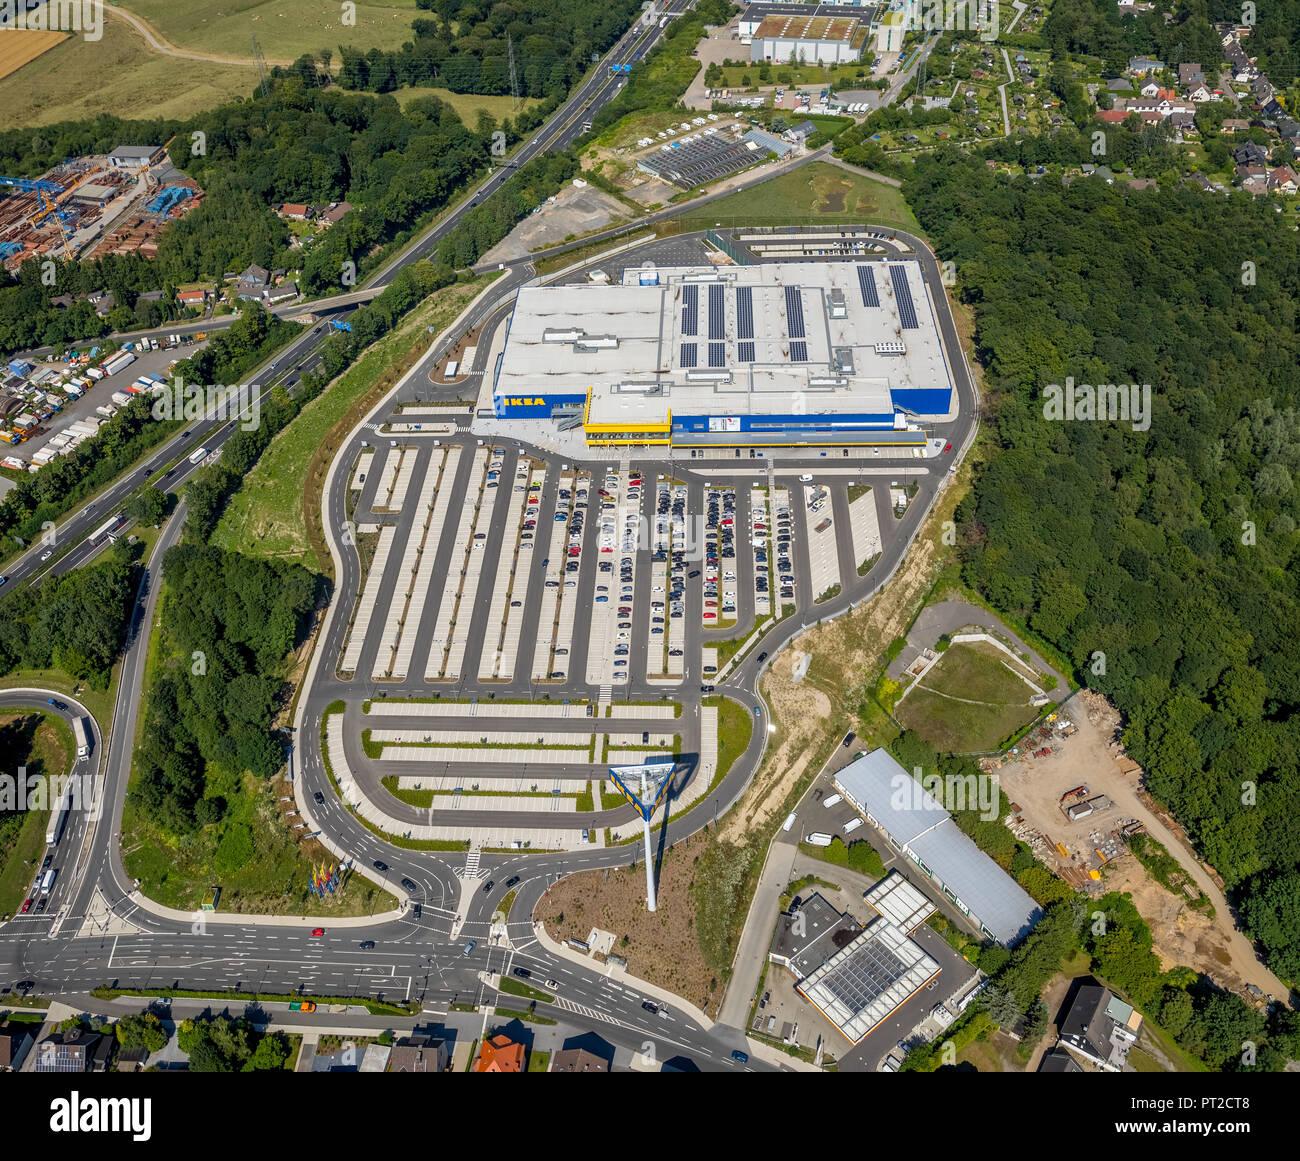 IKEA furniture store Wuppertal, city limits Sprockhövel, Ruhr area, North Rhine-Westphalia, Germany - Stock Image